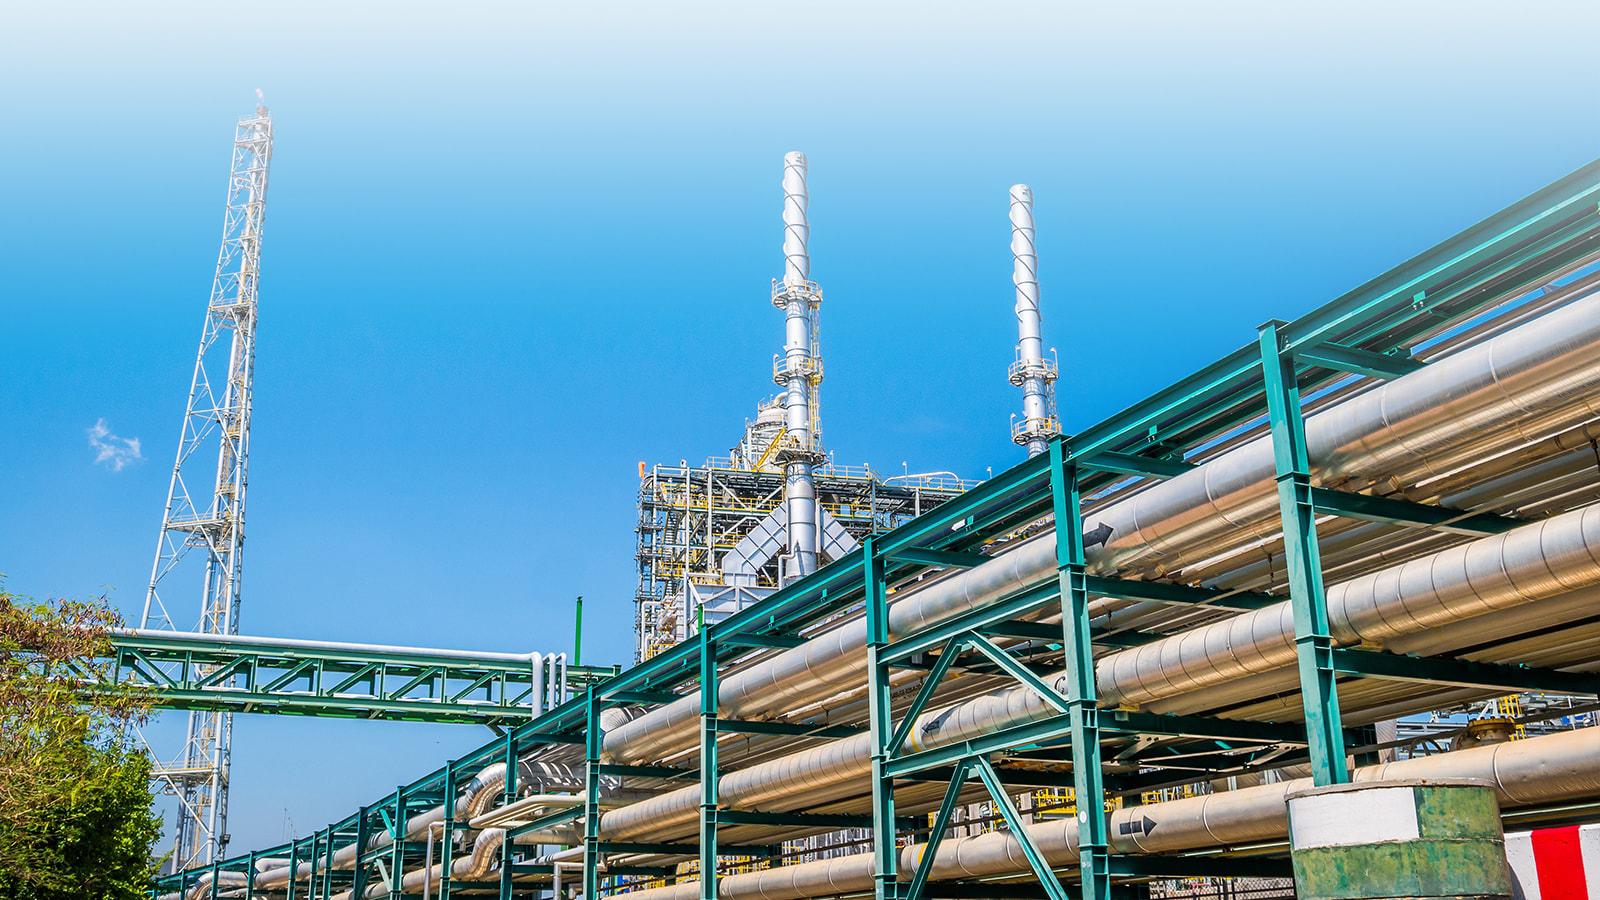 Icona tubi preisolati impianti industriali